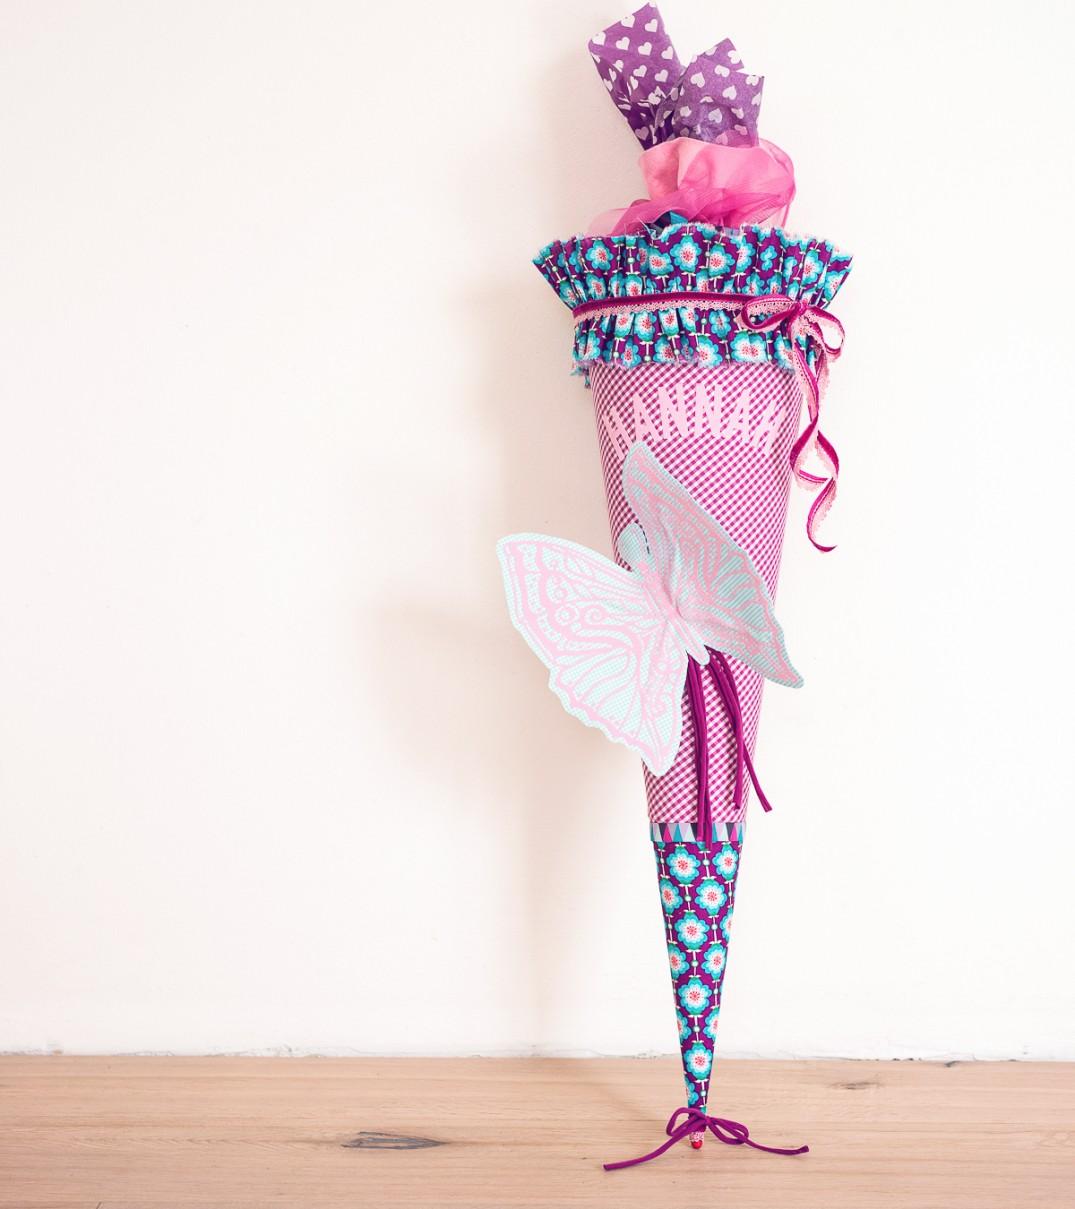 sommerkollektion 2015 jolijou patchwork schultüte frau liebstes-15